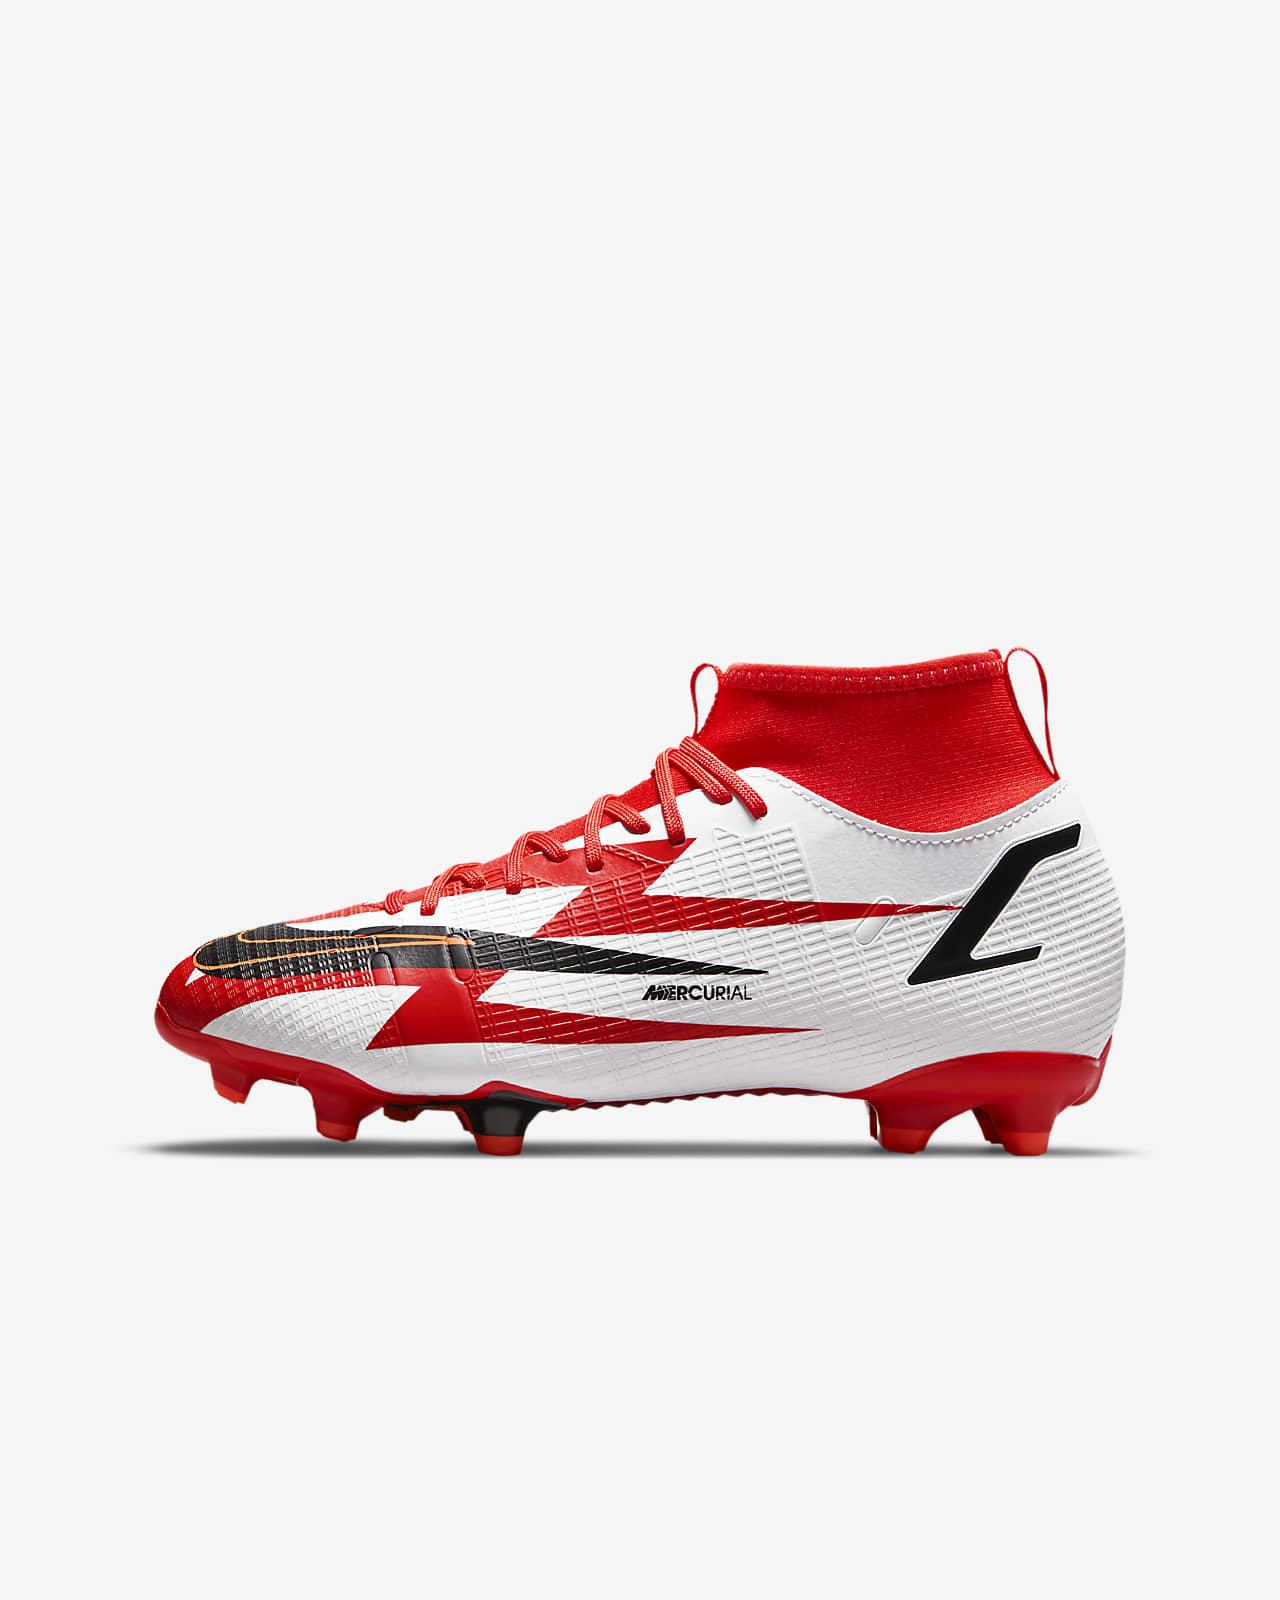 Scarpa da calcio multiterreno Nike Jr. Mercurial Superfly 8 Academy CR7 MG - Bambini/Ragazzi